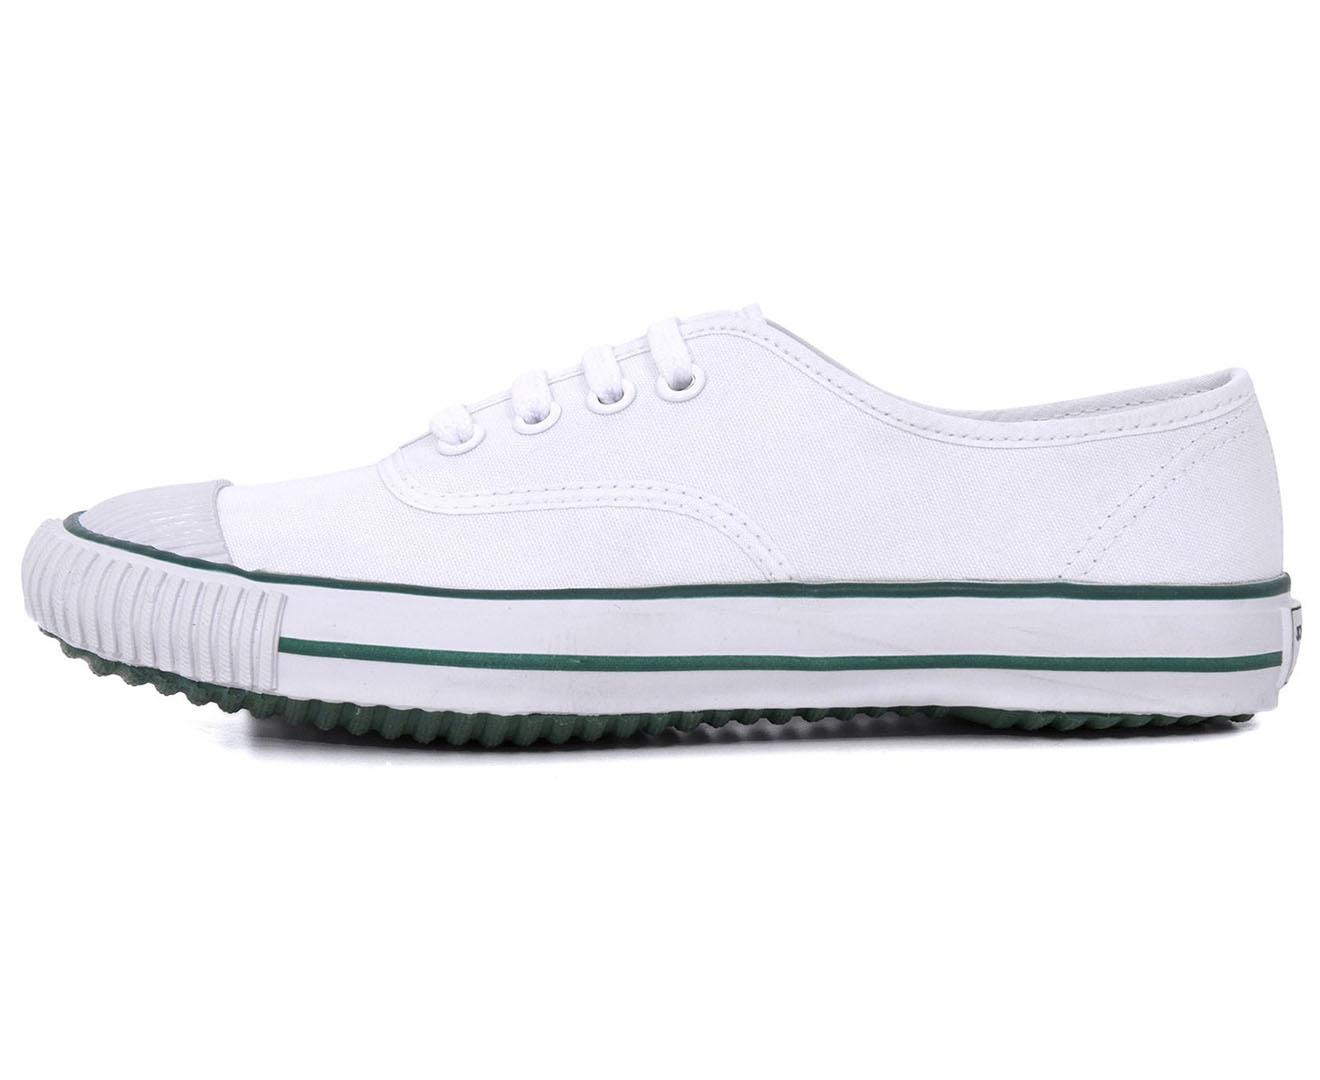 Bata Unisex Tennis Canvas Shoe - White